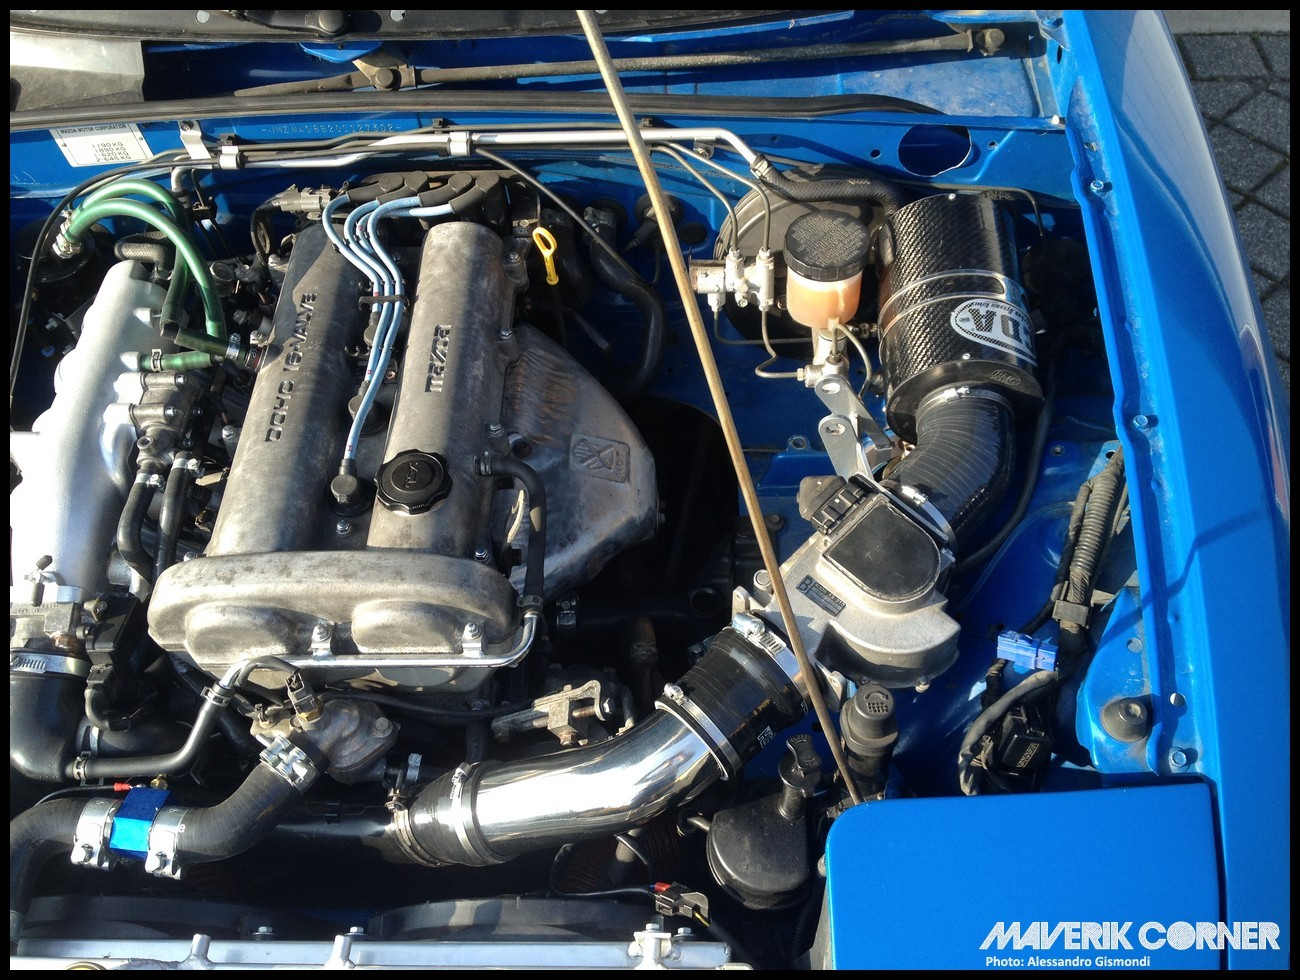 Maverik Corner MX5: Engine Rebuild - Let's start - Part #1